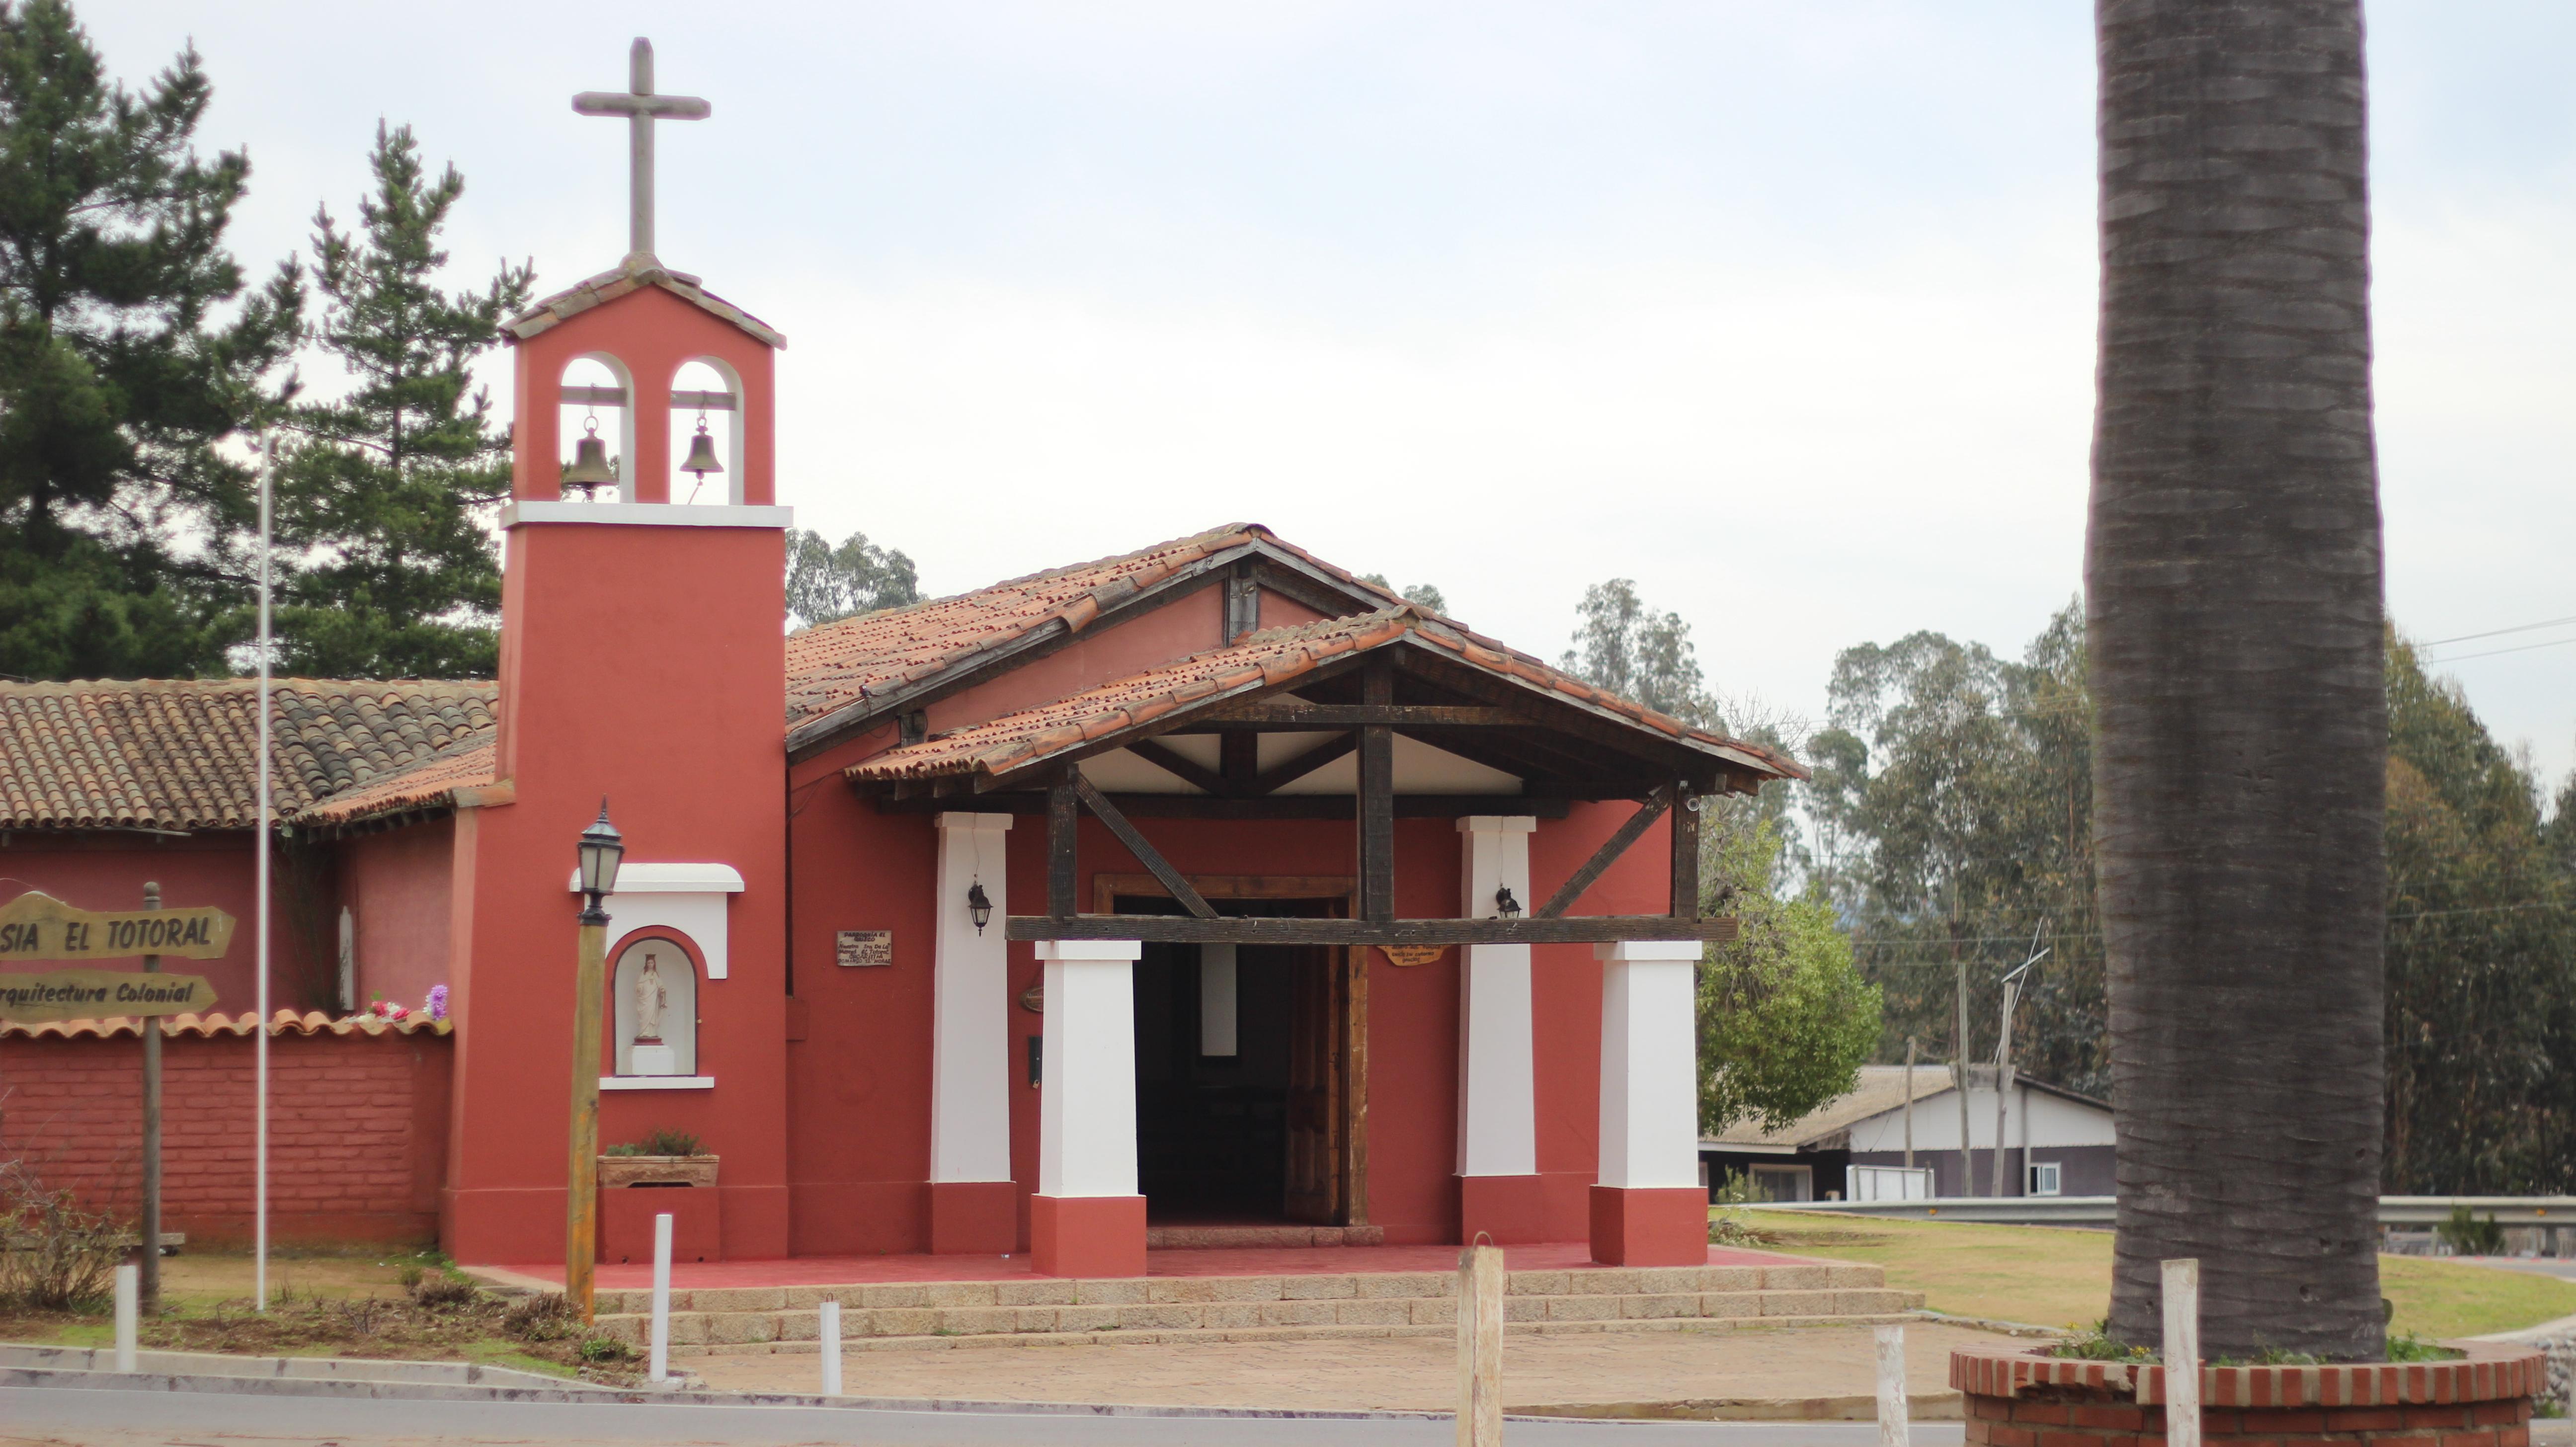 Iglesia El Totoral